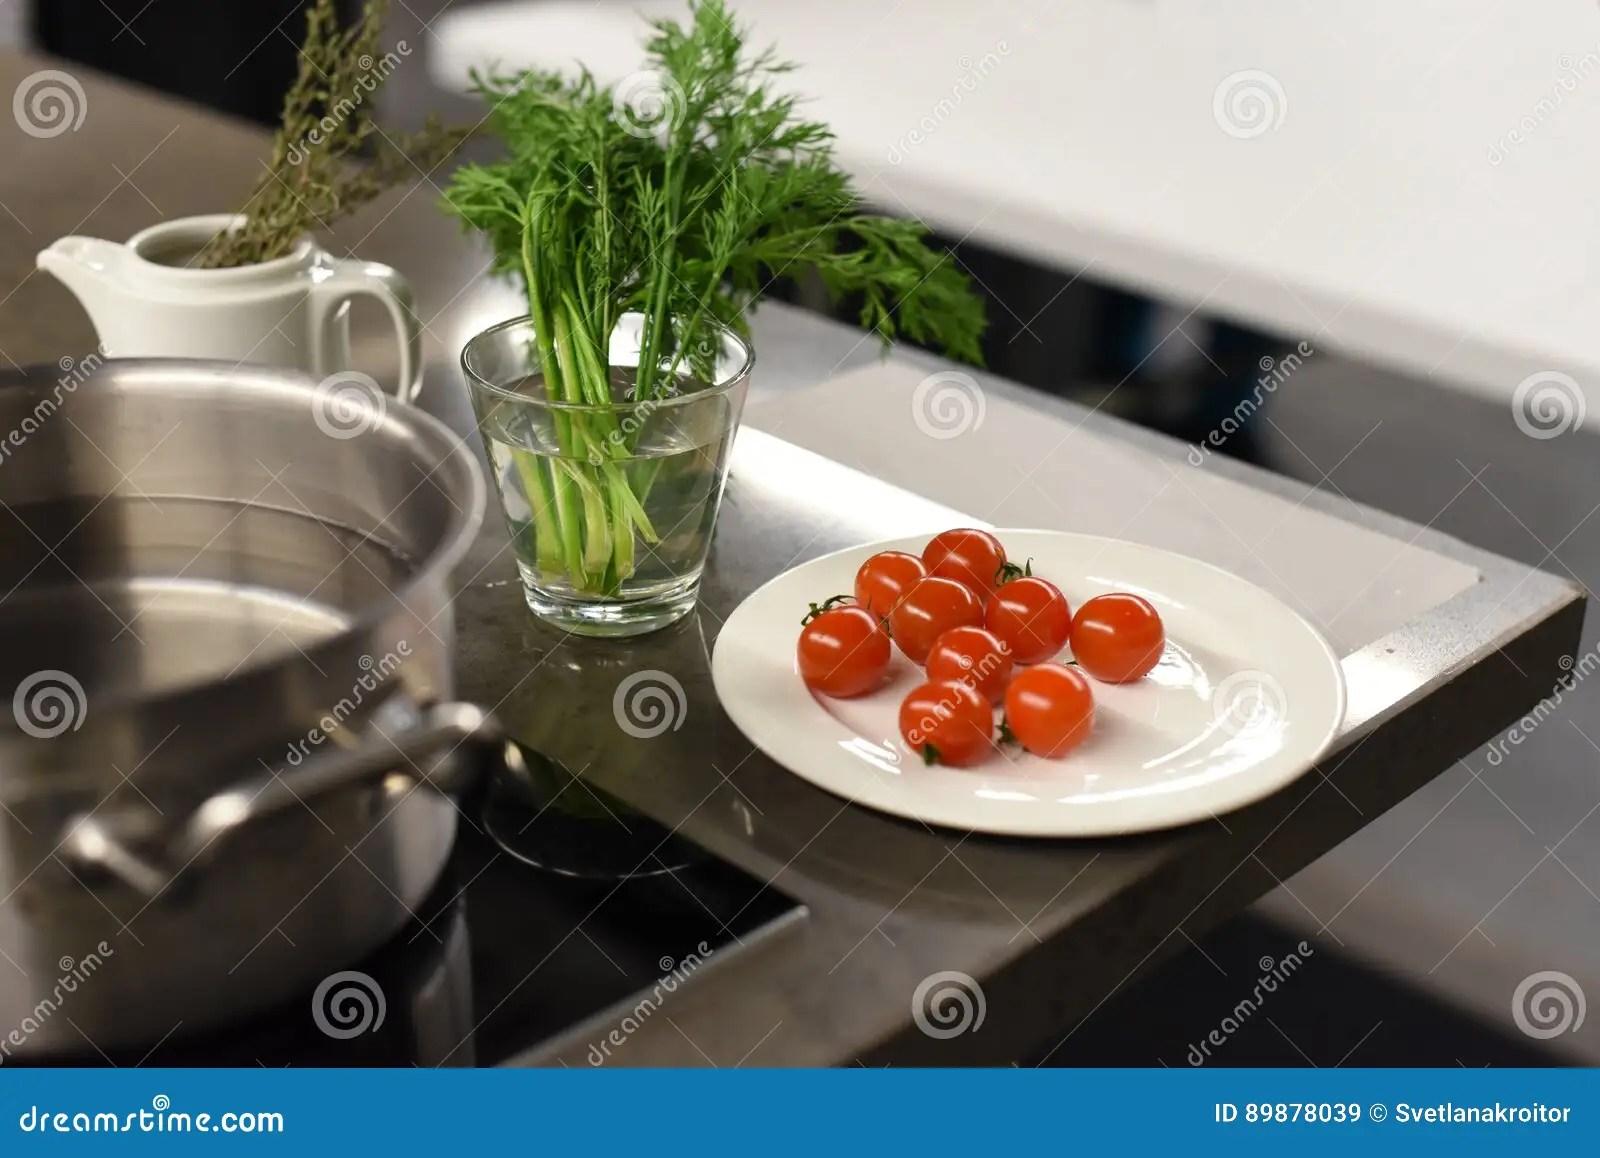 kitchen prep table large pantry 与菜的金属厨房用桌表面为烹调和金属平底深锅做准备库存图片 图片包括有 金属厨房用桌表面的照片与菜的为烹调和金属平底深锅做准备